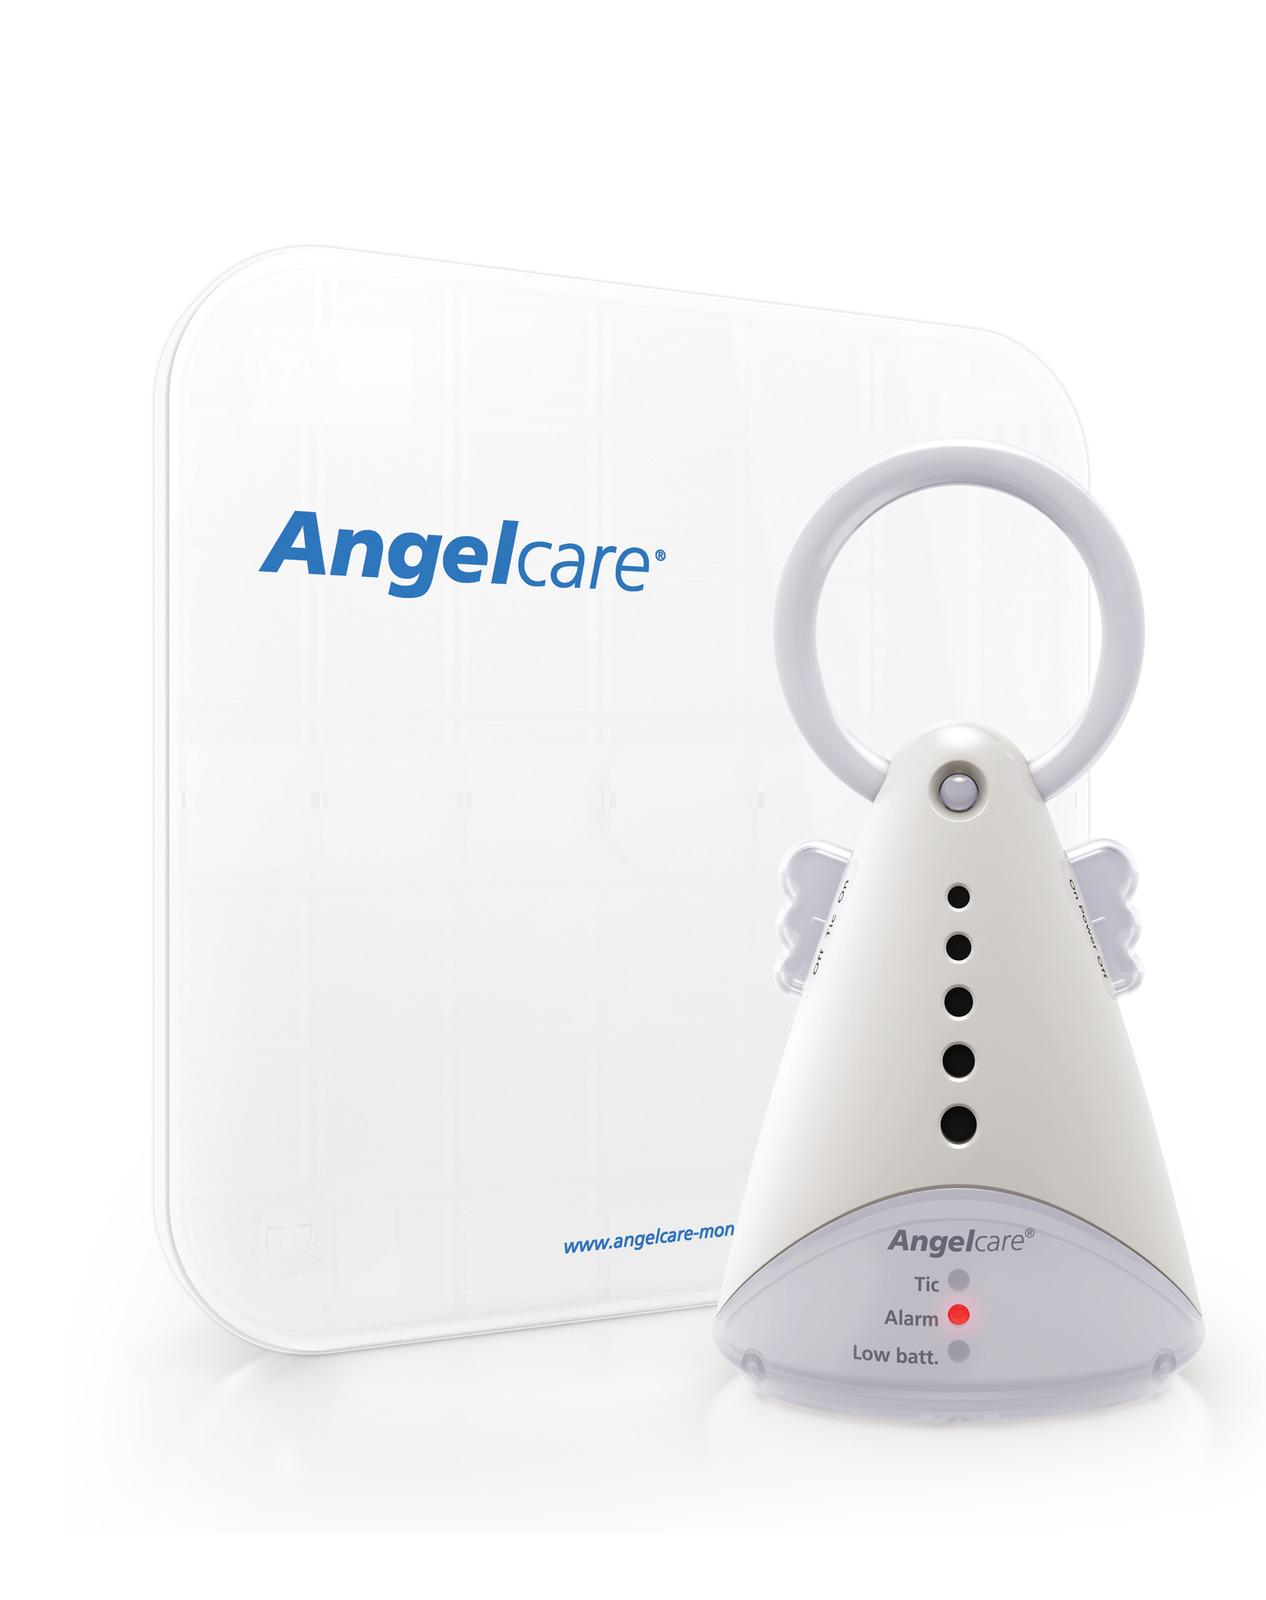 angelcare ac300 movement monitor babyroad. Black Bedroom Furniture Sets. Home Design Ideas